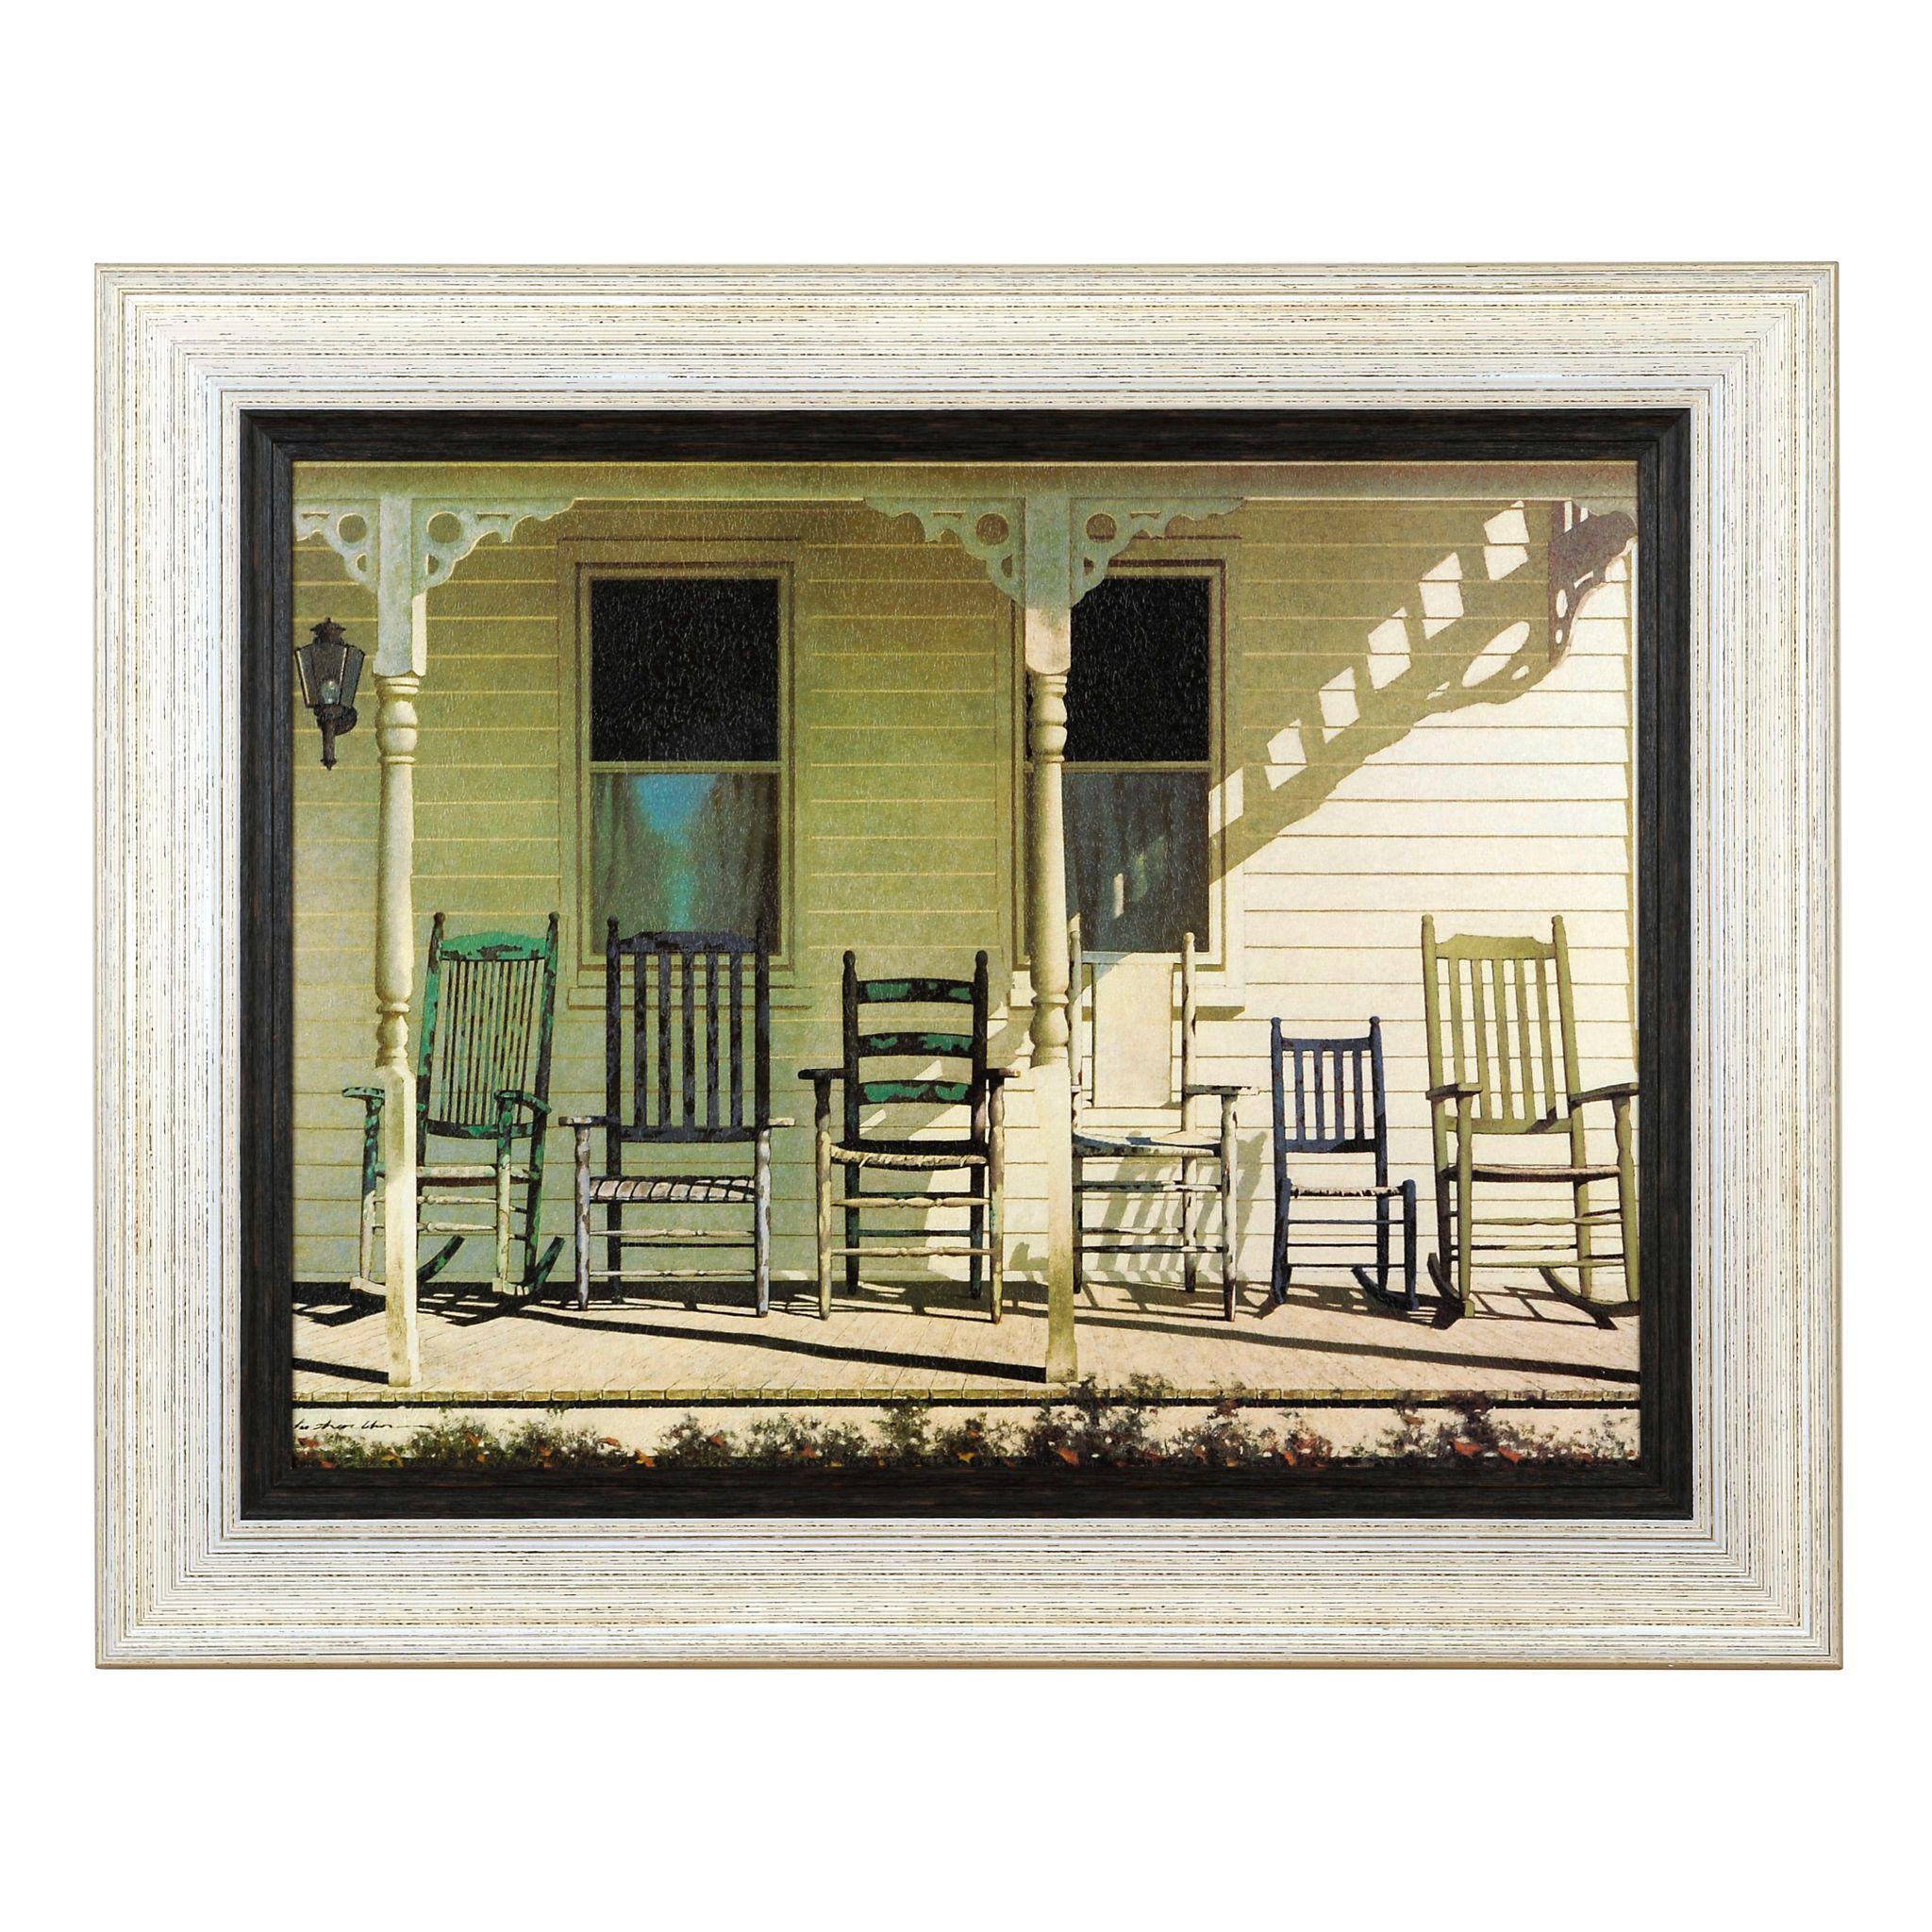 Farmhouse Family Rocking Chairs Framed Art Print | Pinterest ...